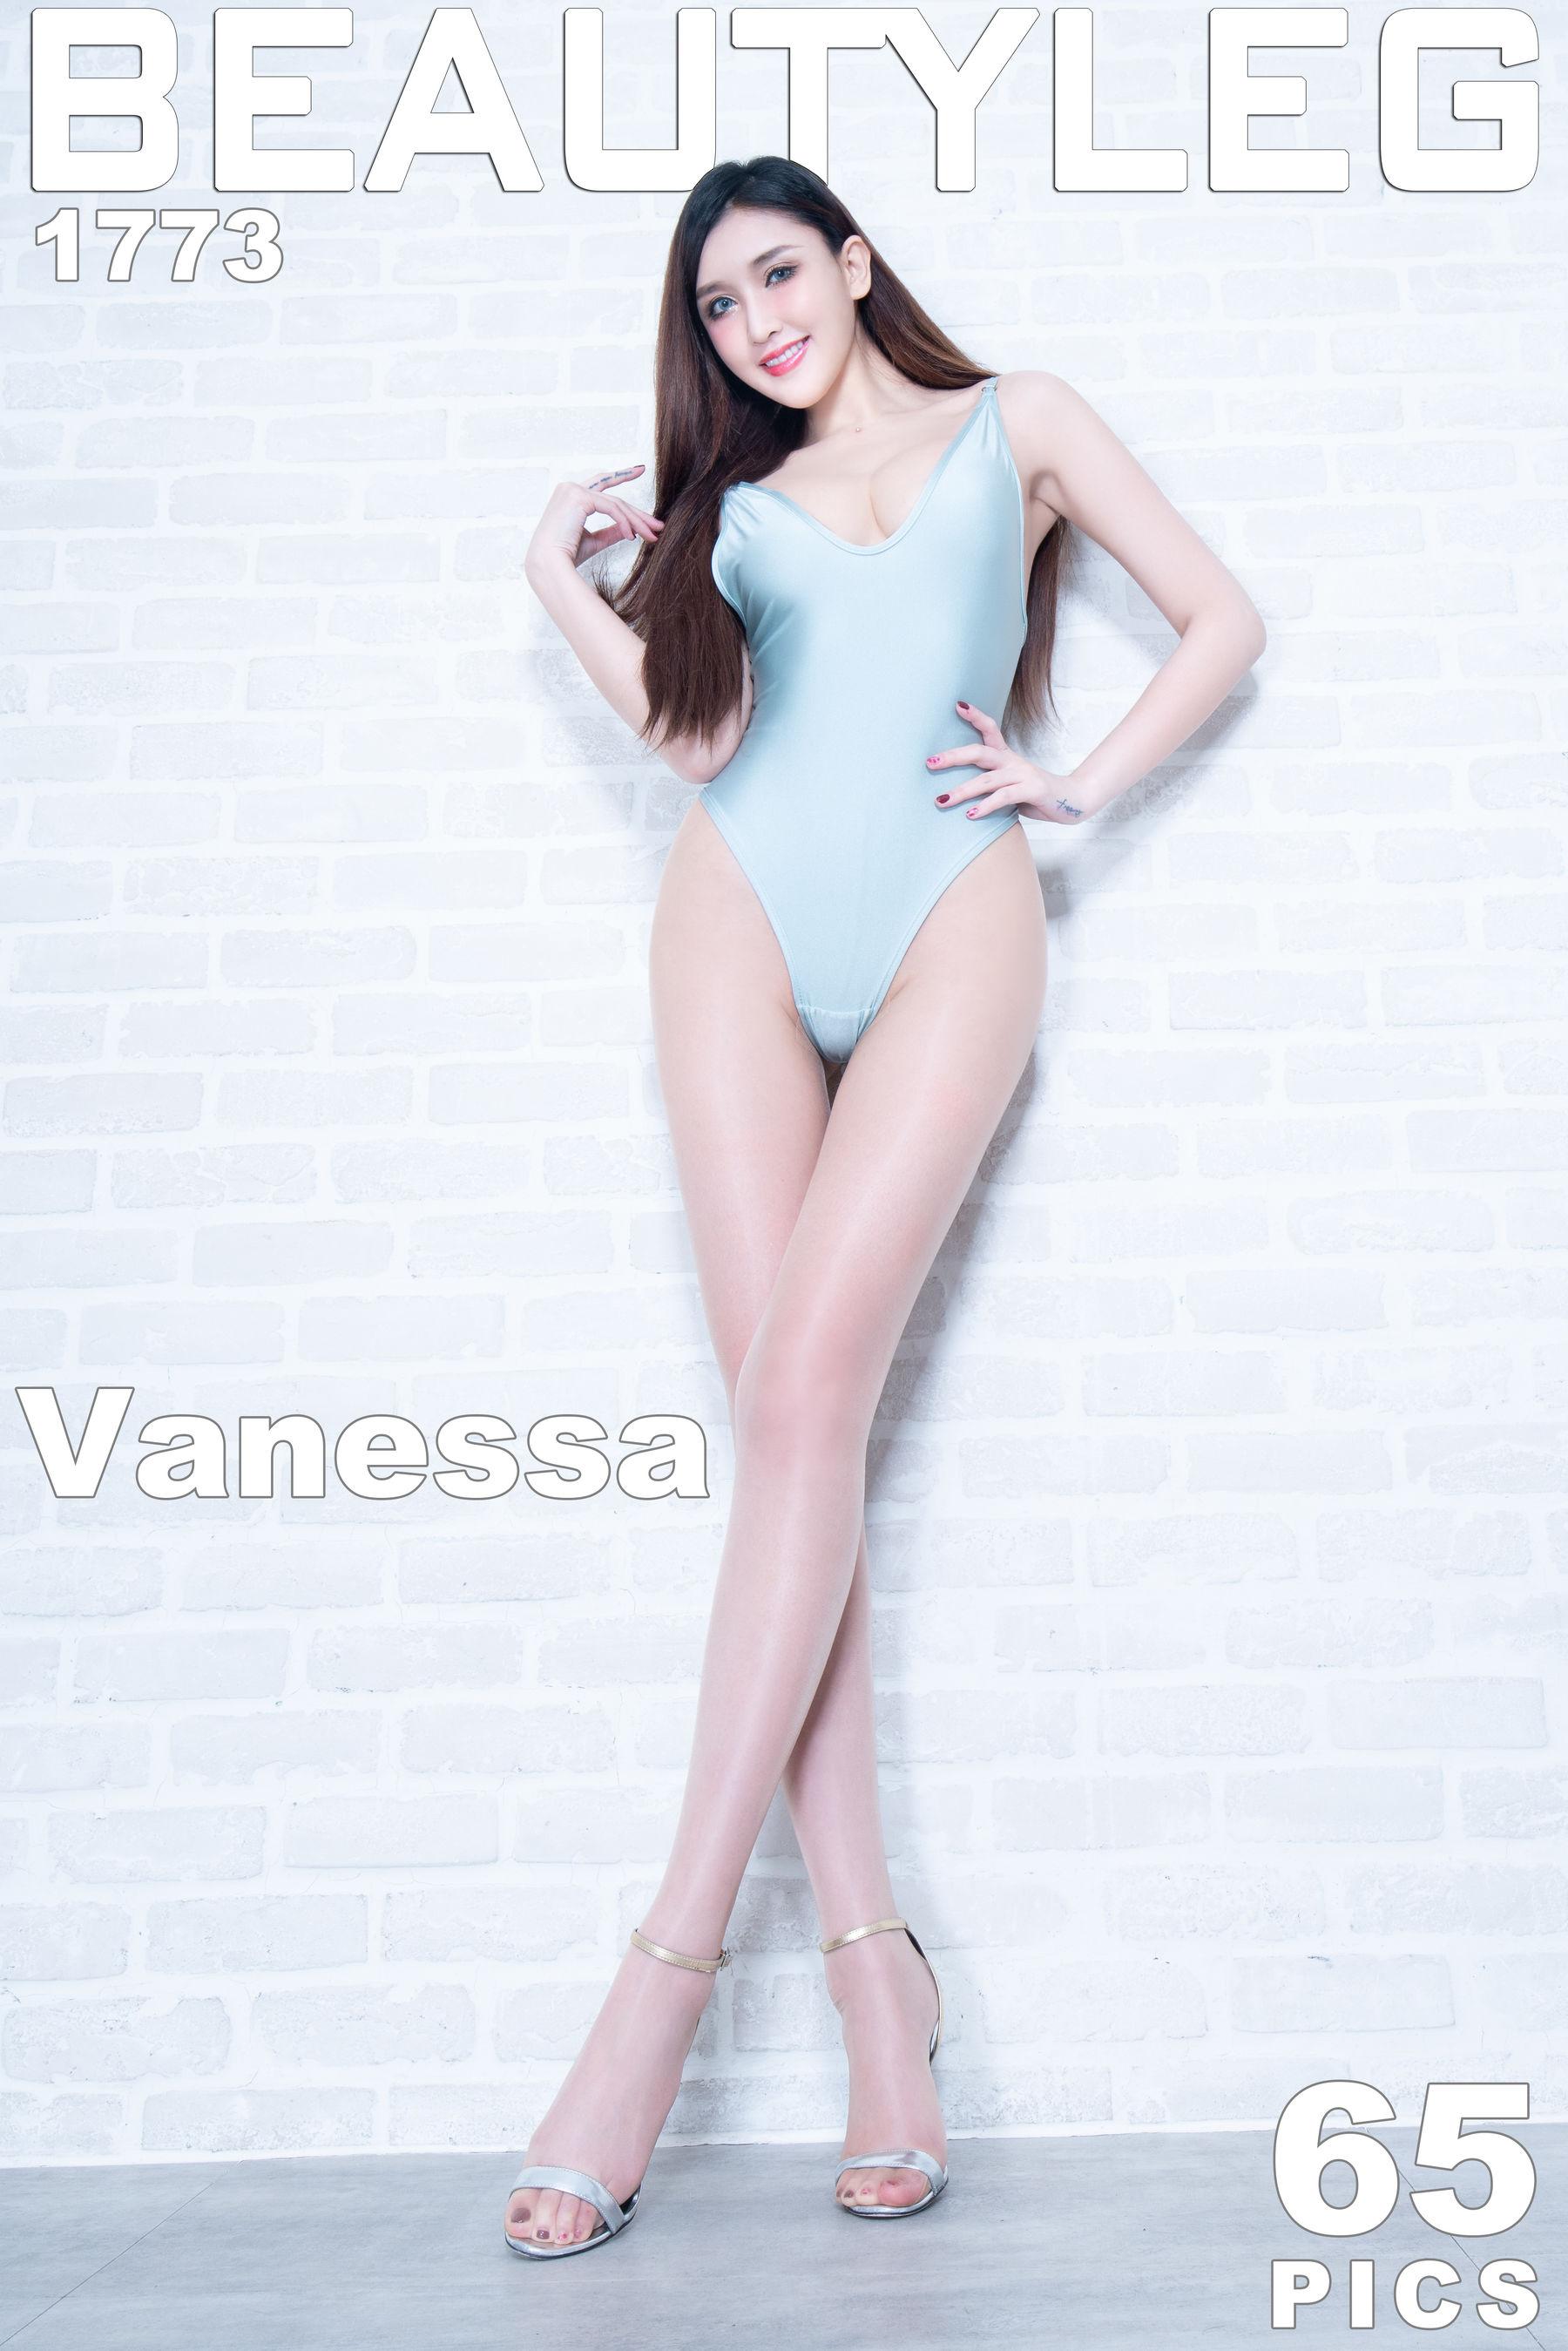 VOL.183 [Beautyleg]内衣美女长腿美女:任育萱(腿模Vanessa)超高清个人性感漂亮大图(60P)